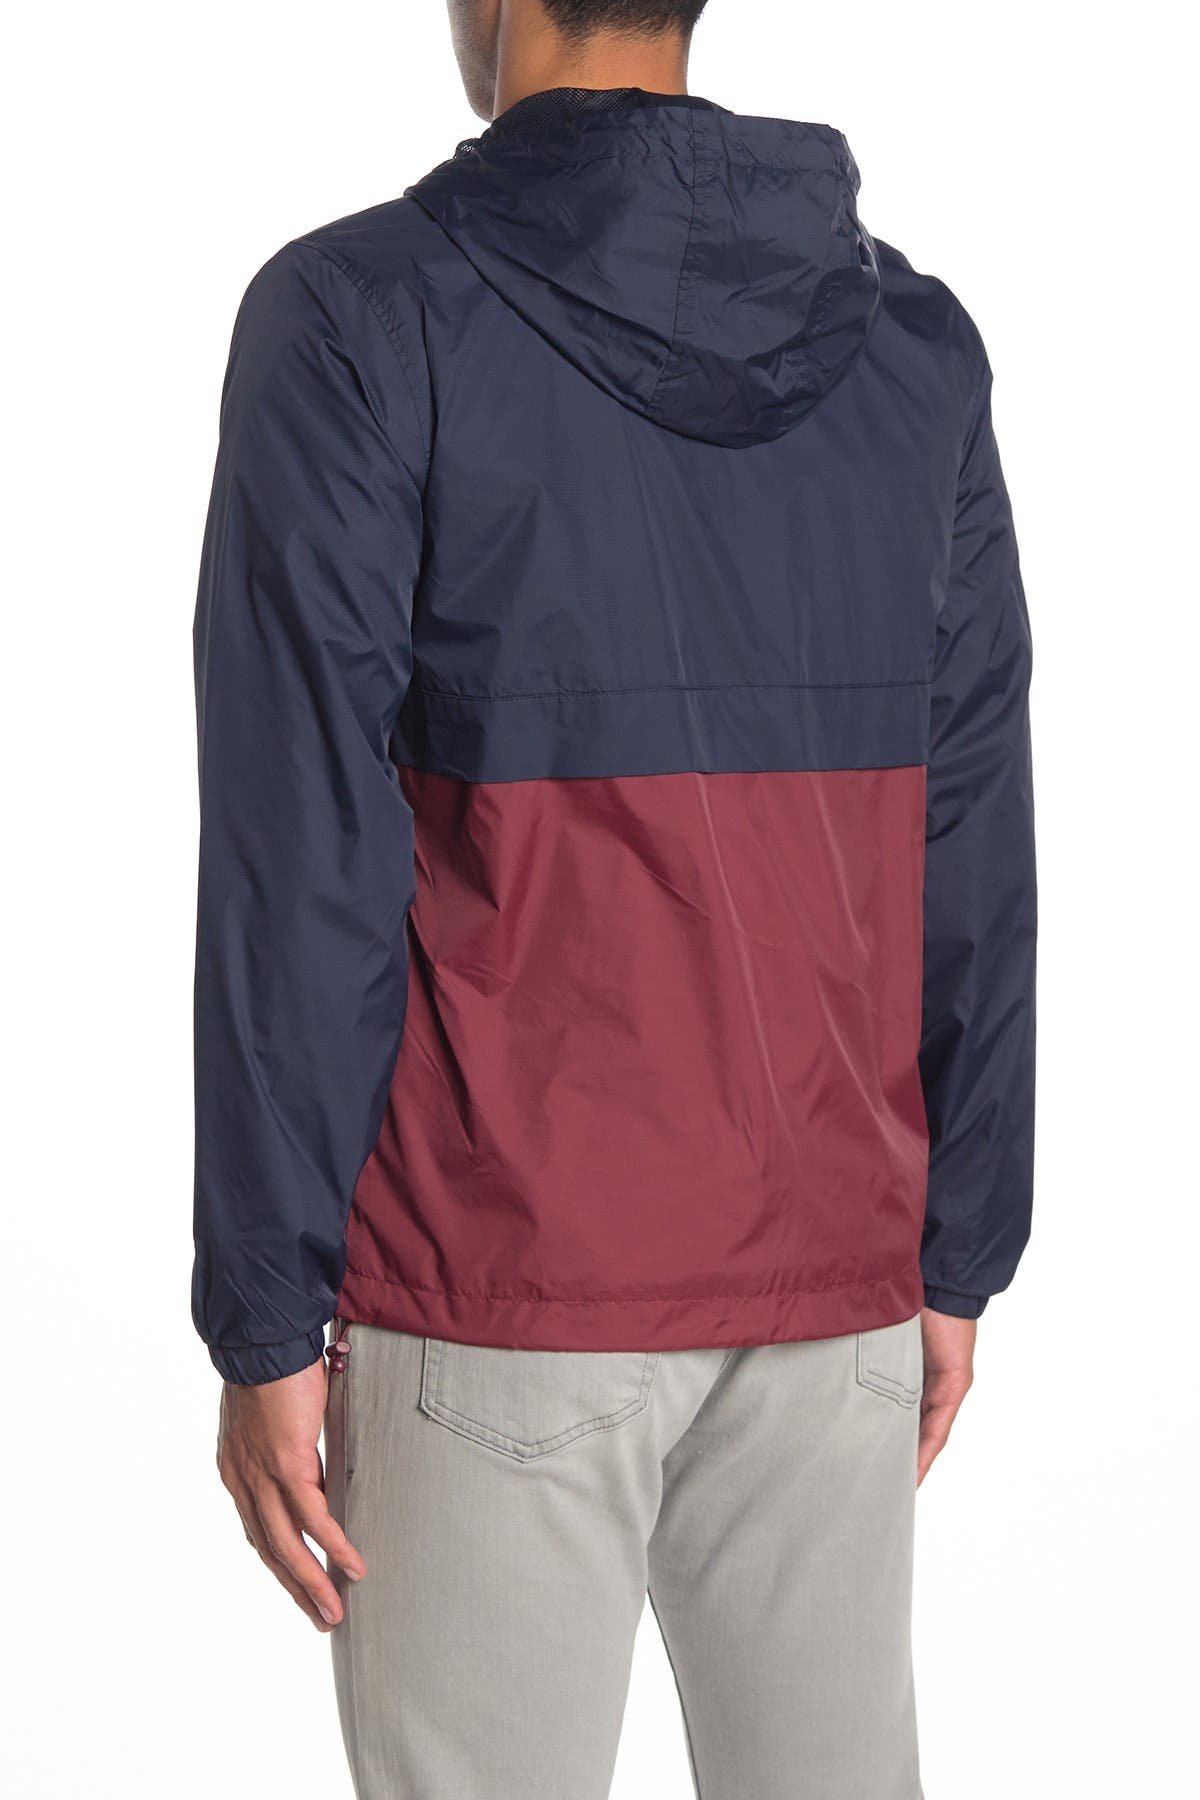 Volcom Mens Halfmont Jacket